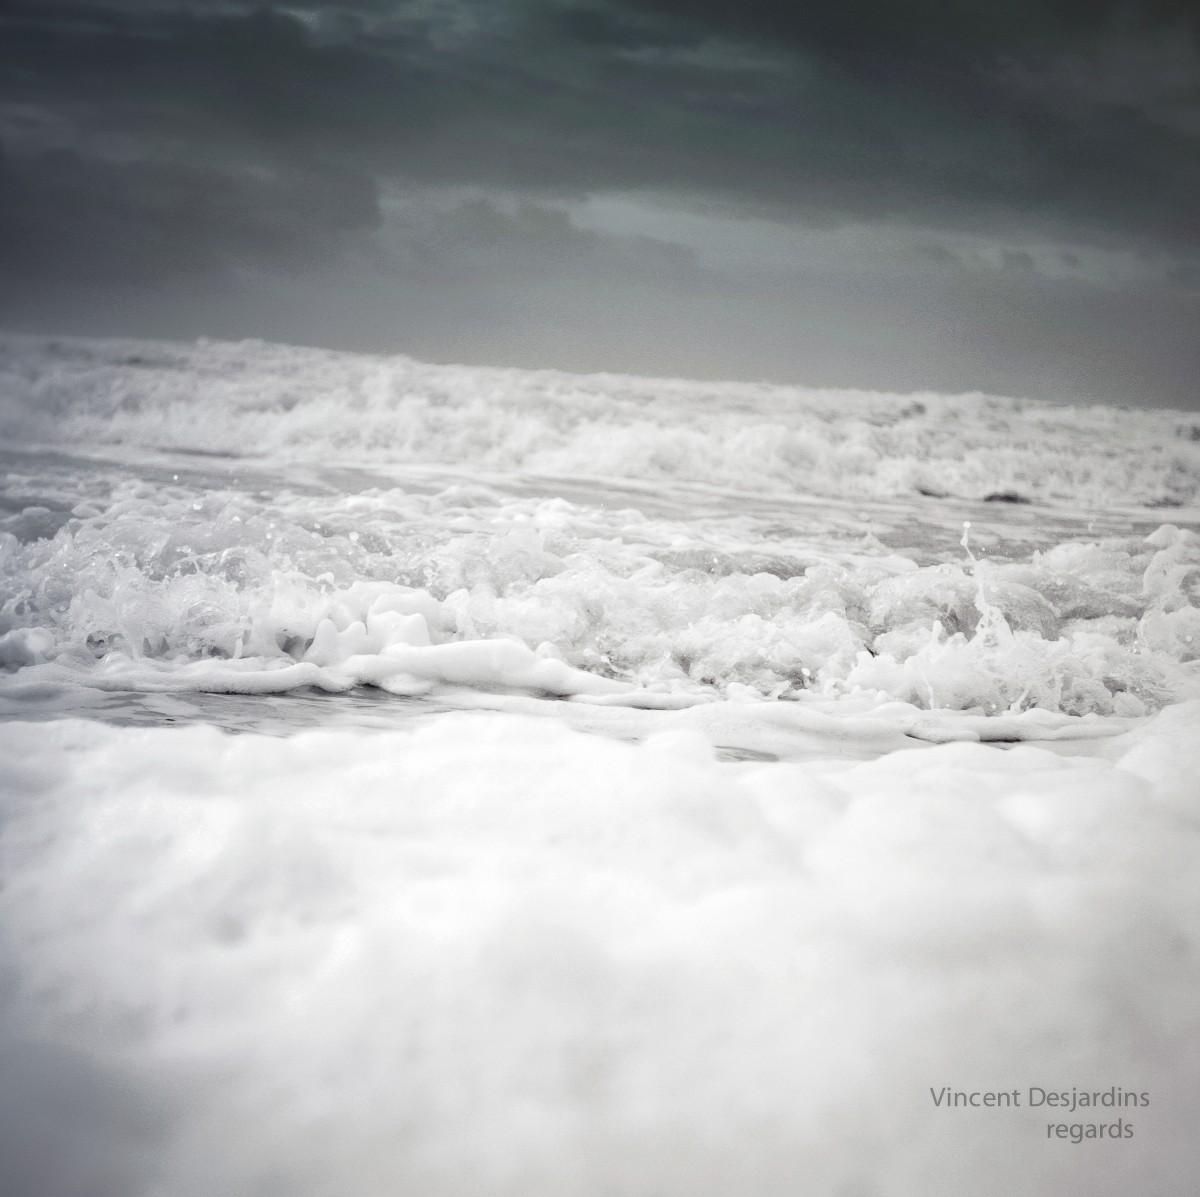 snow winter seasons sea - photo #22